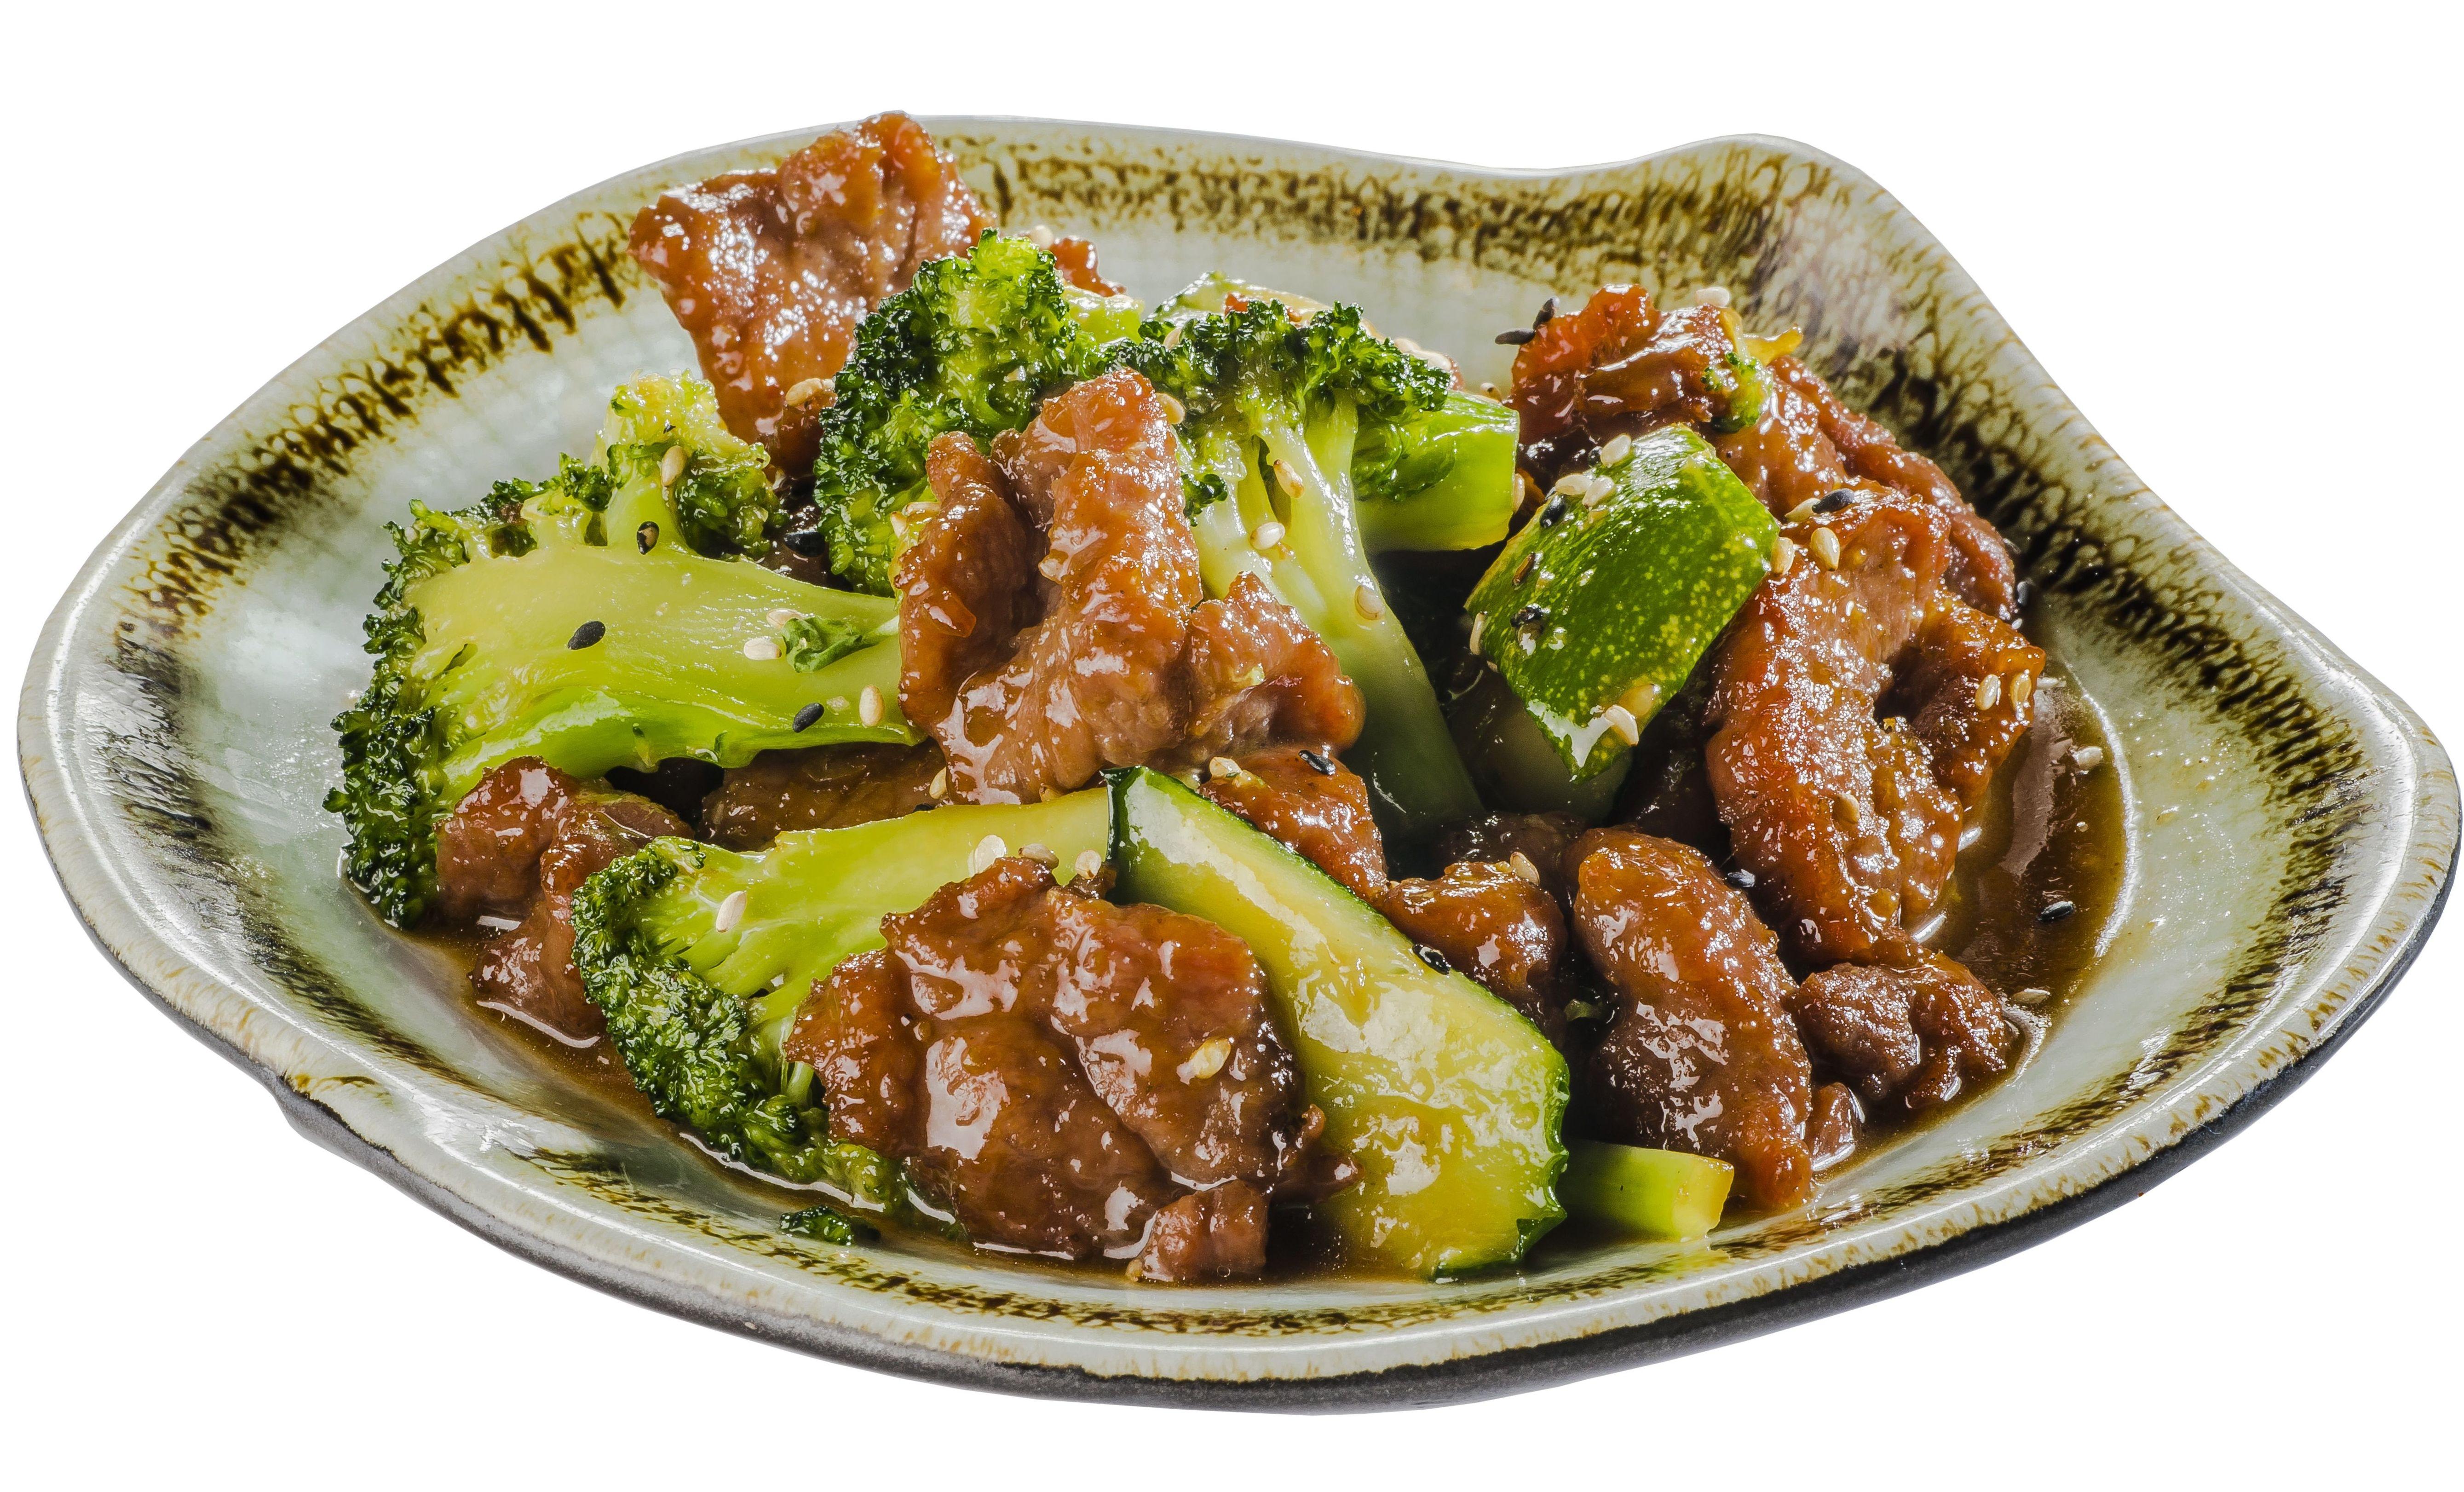 Ternera salteada con verdura en salsa yakiniku  7,50€: Carta de Restaurante Sowu